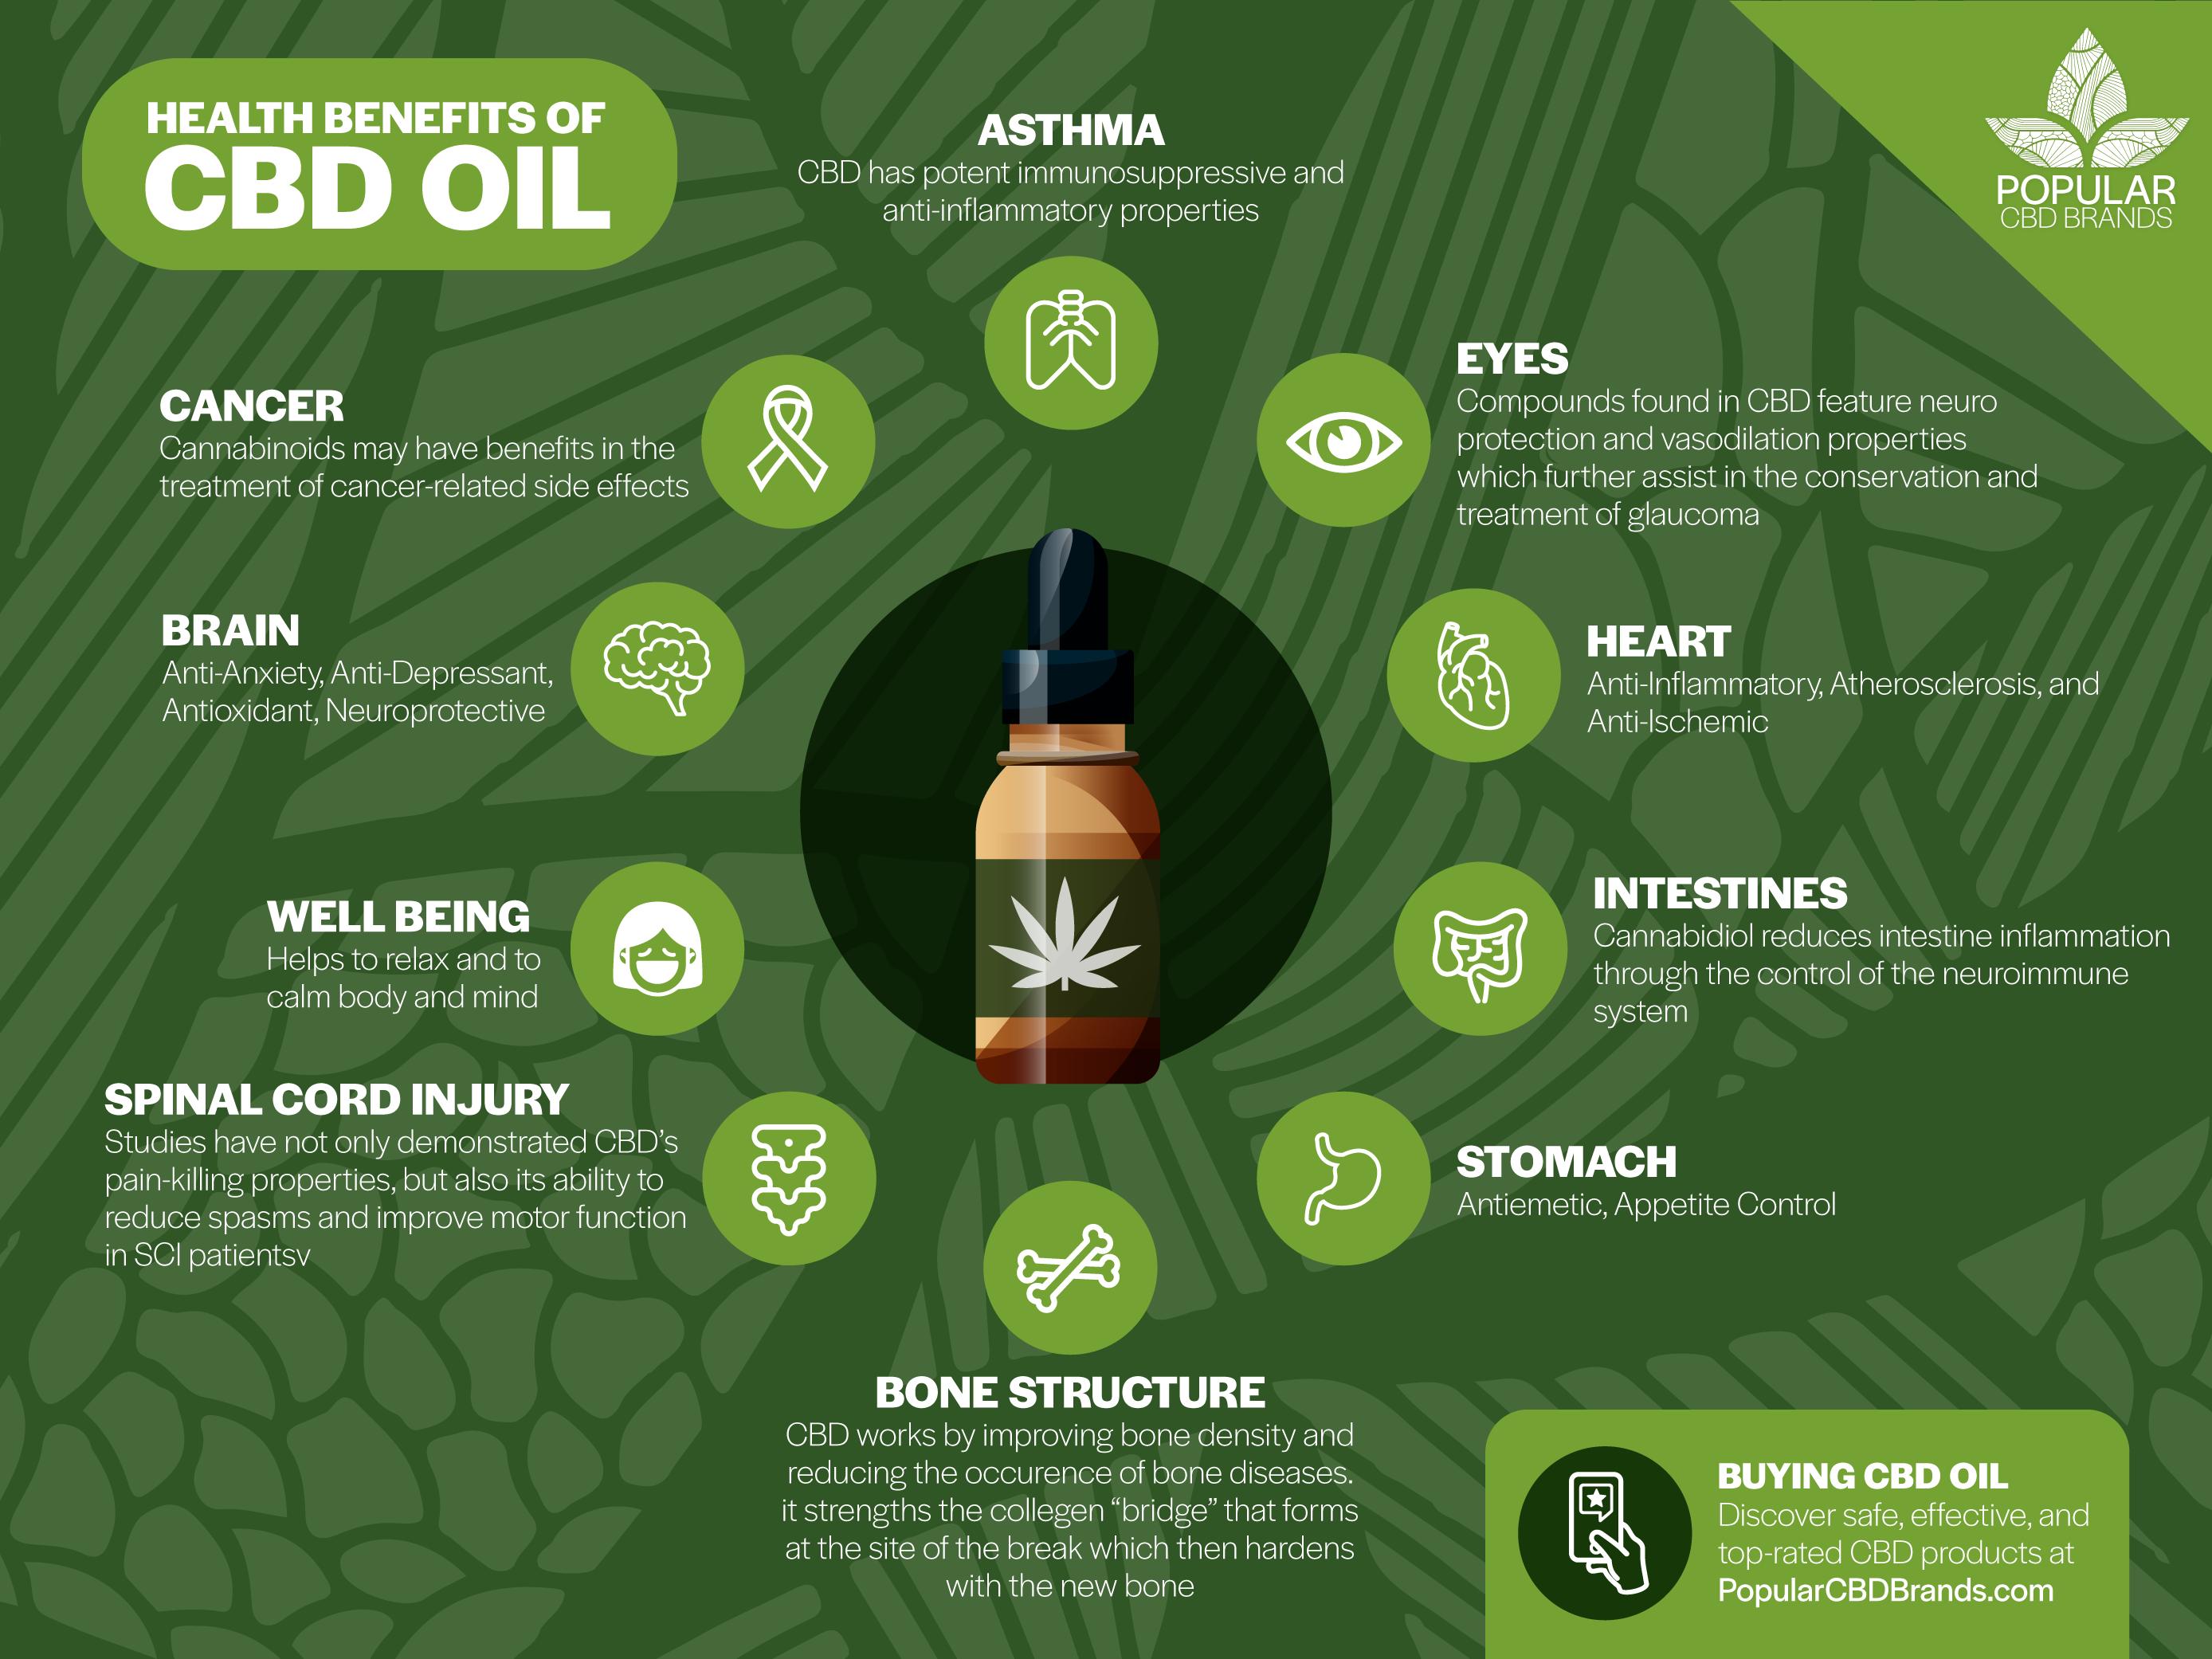 David Suzuki Hemp Oil